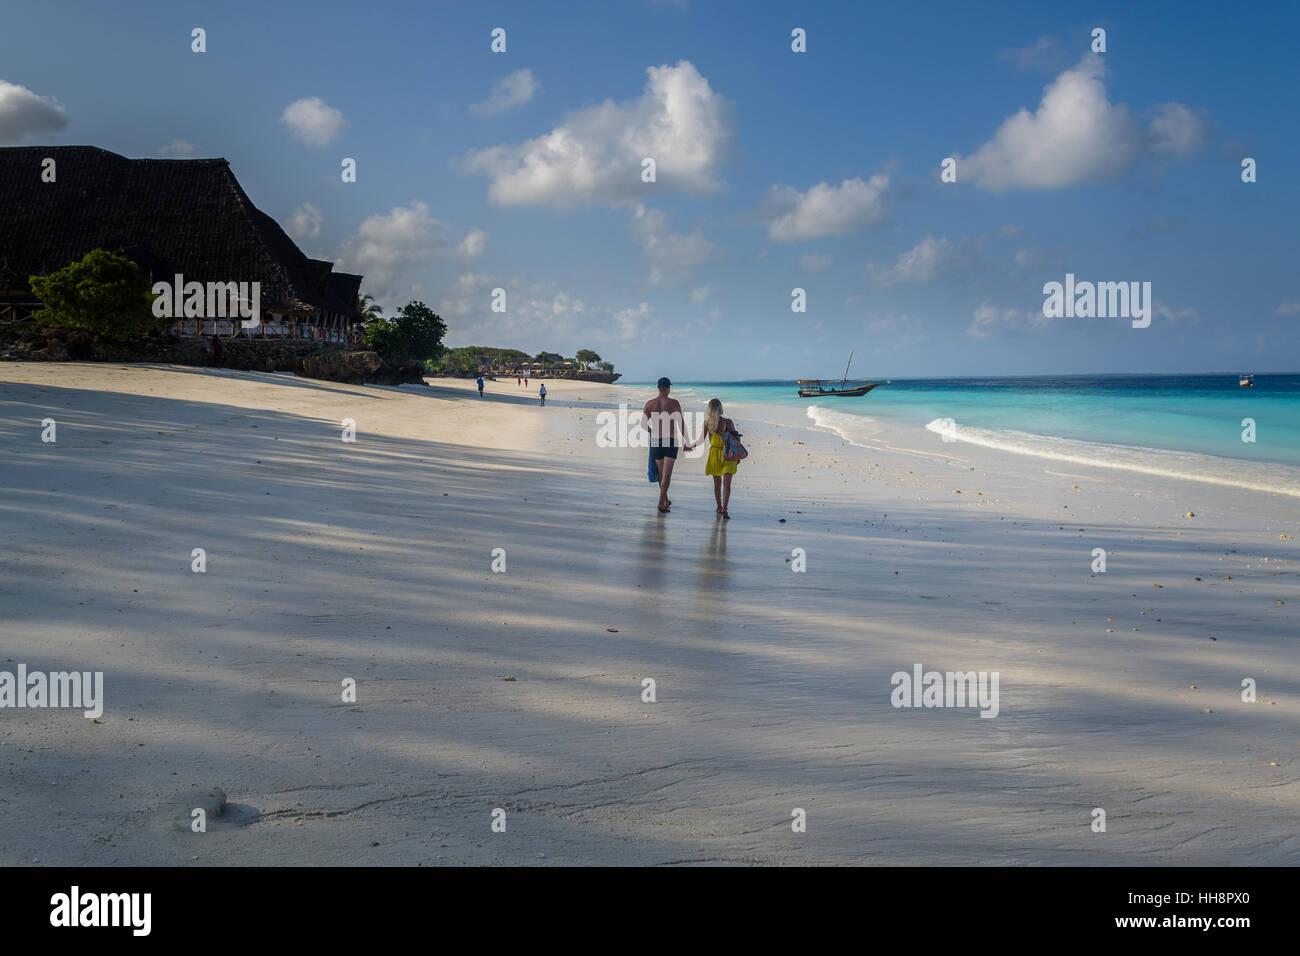 Romantic beach walking early morning at Zanzibar - Stock Image